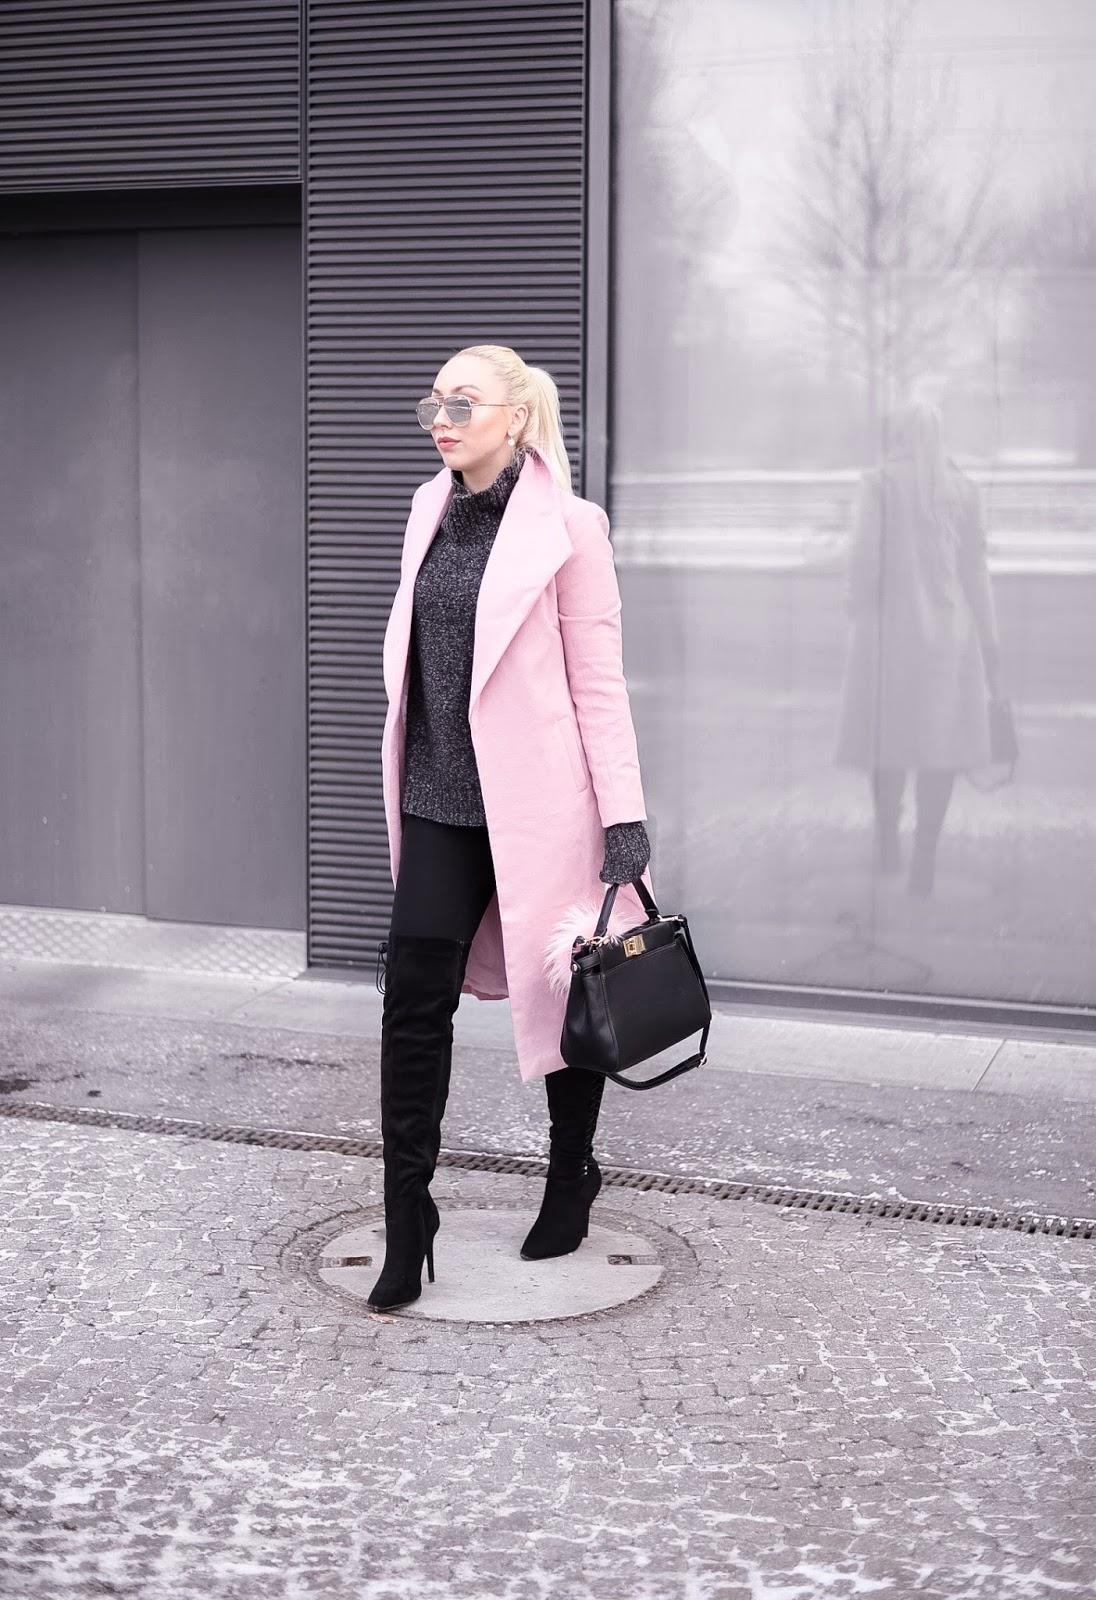 fashionblogger streetstyle_winter streetstyle_pink coat_fendi peekaboo